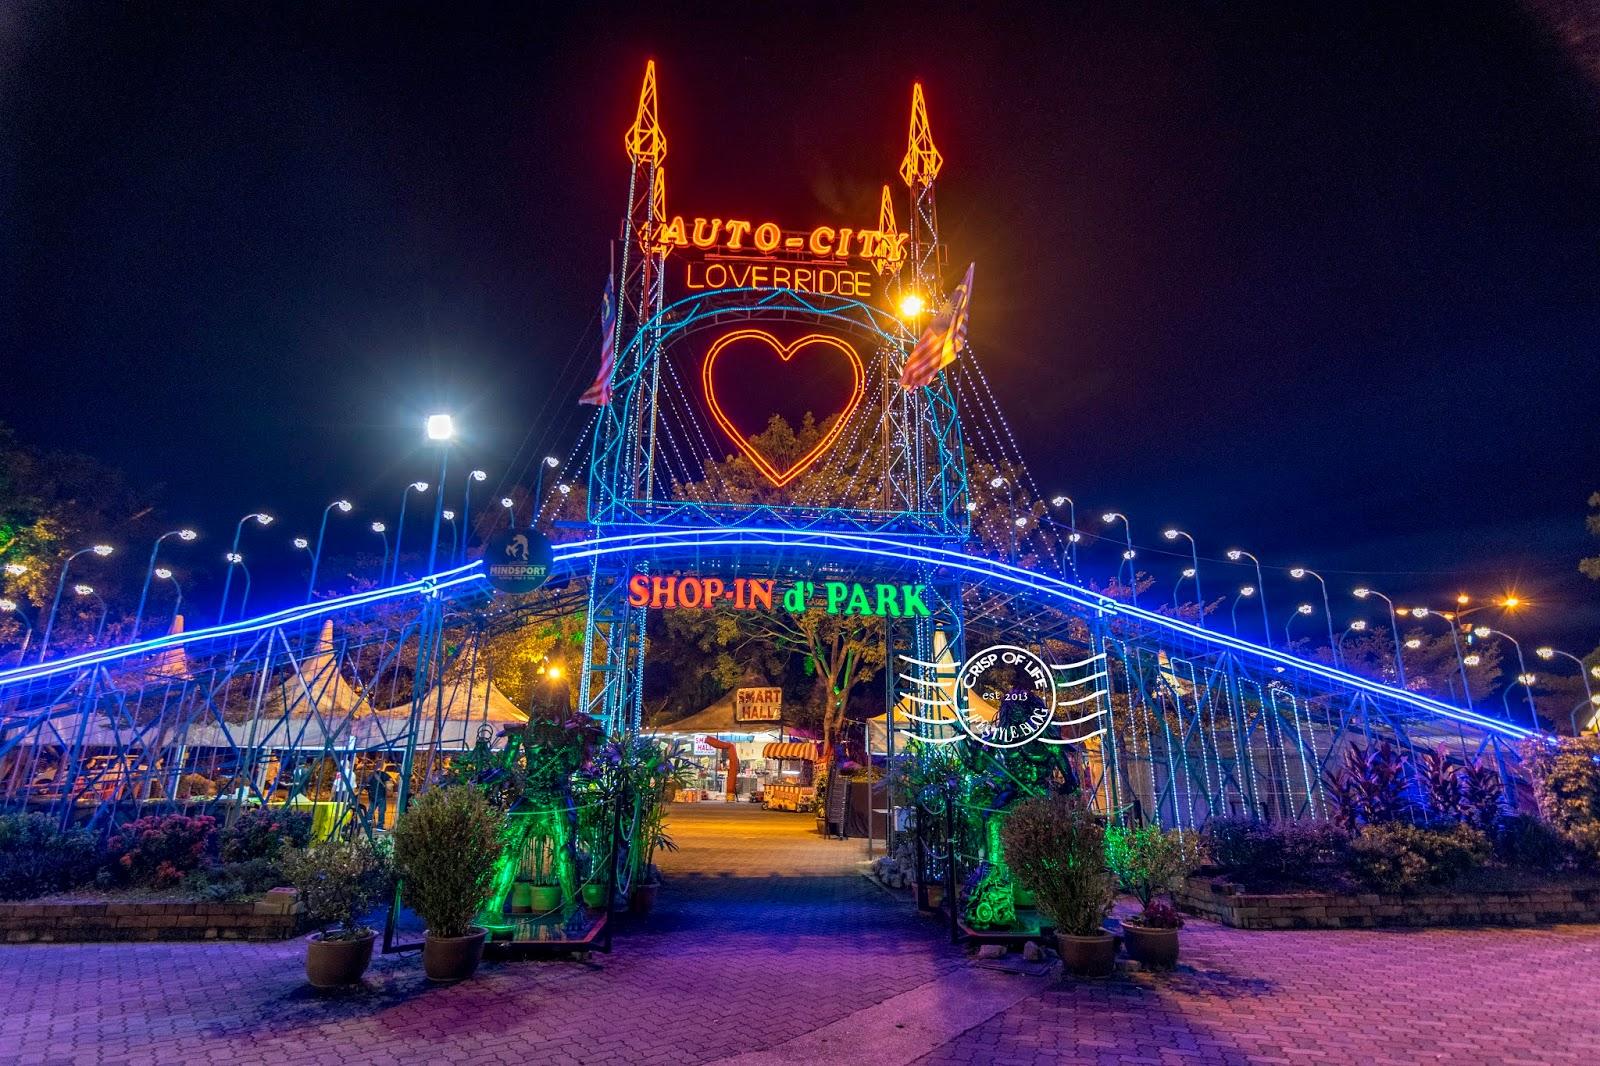 Challenge Yourself at Juru Auto City October Halloween Month